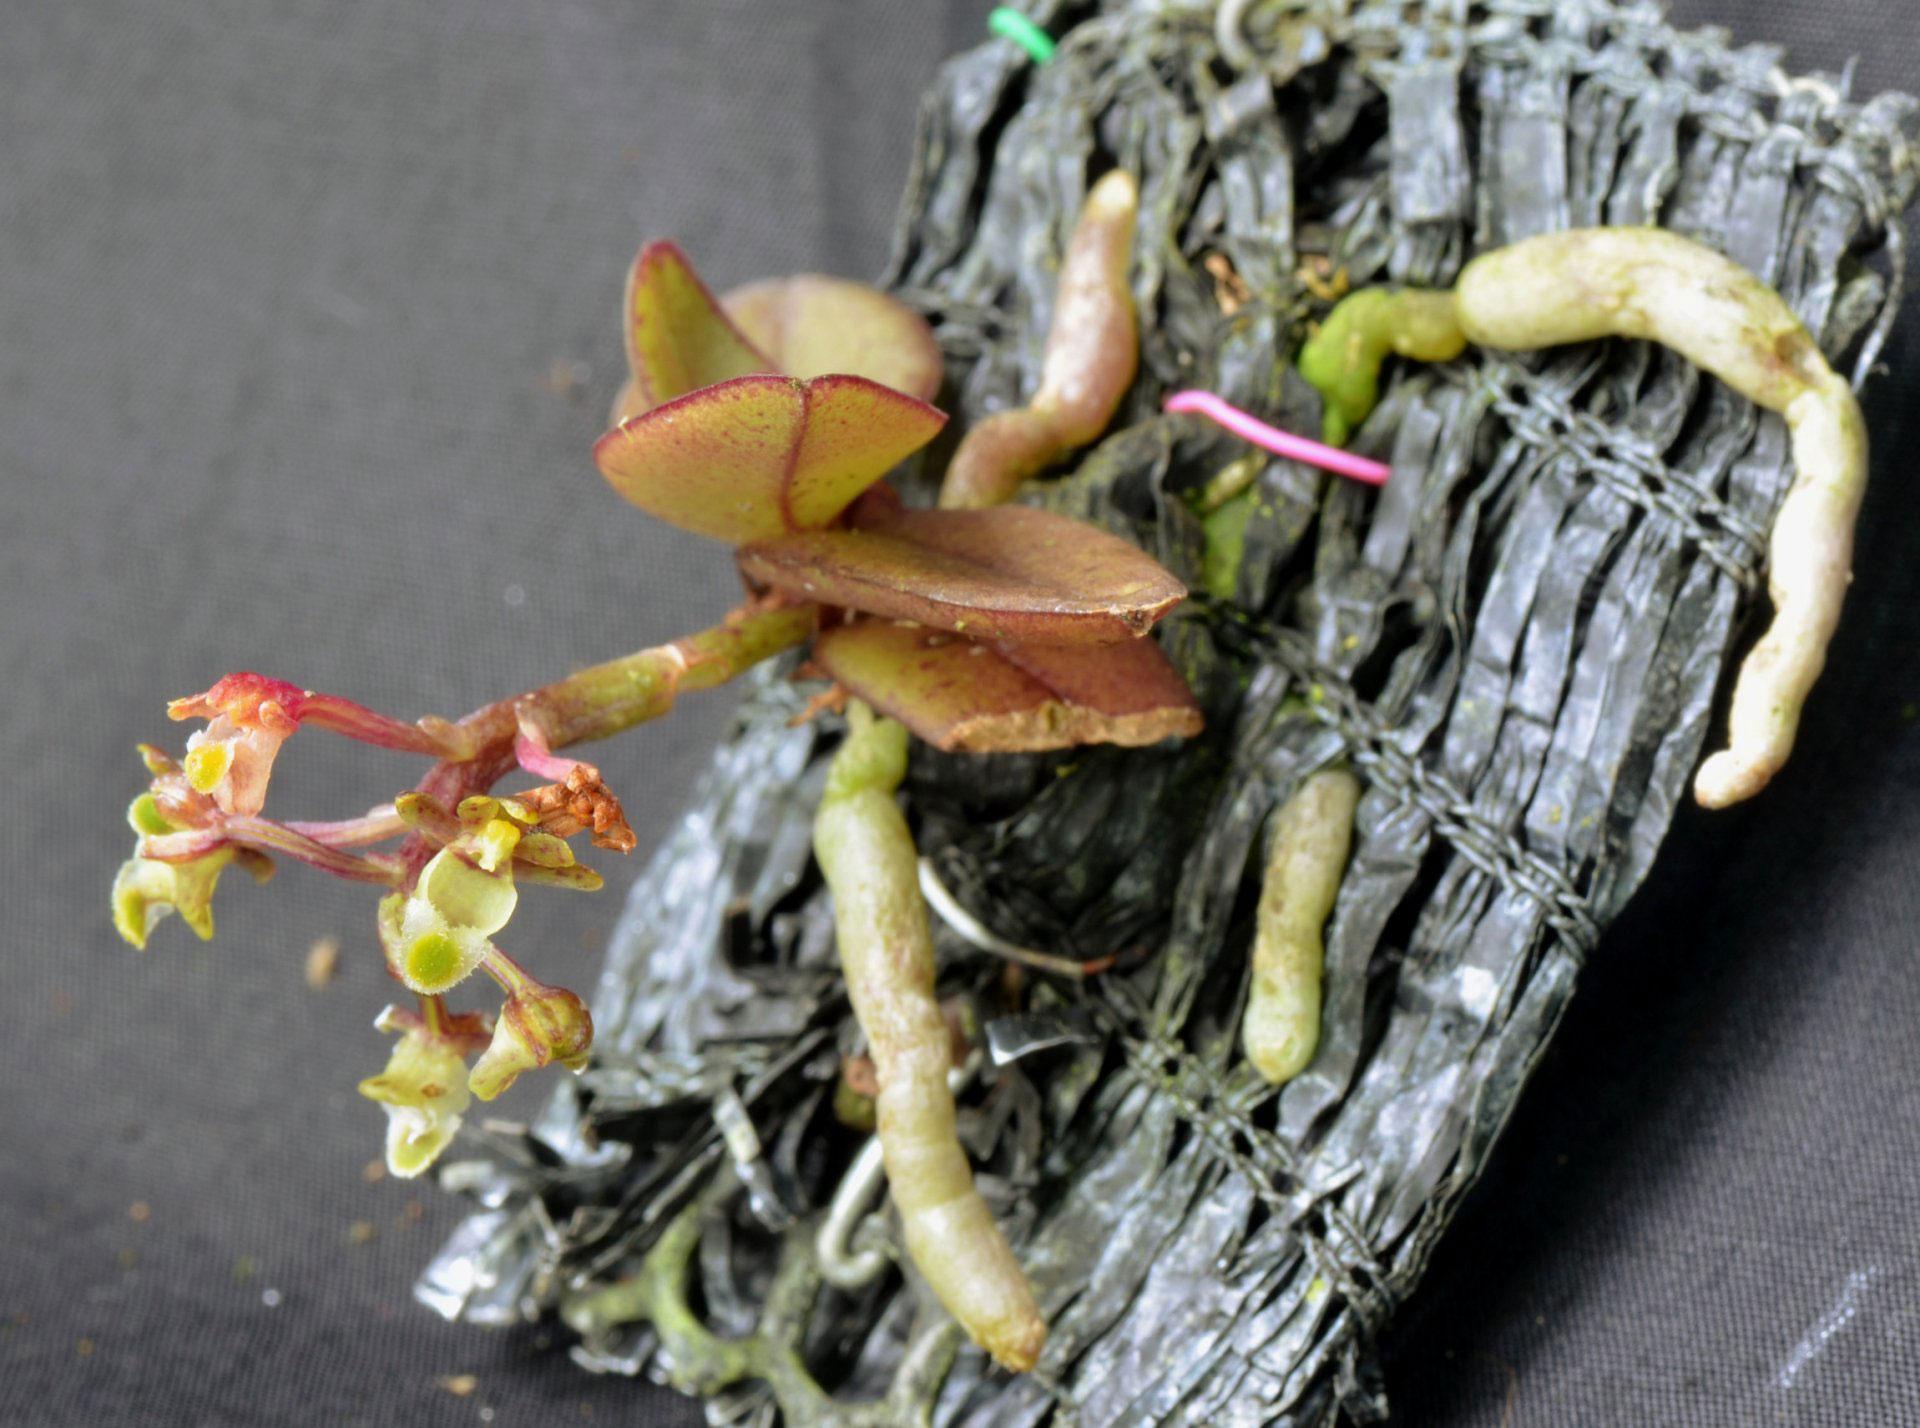 滇南盆距兰Gastrochilus platycalcaratus (Rolfe) Schltr.